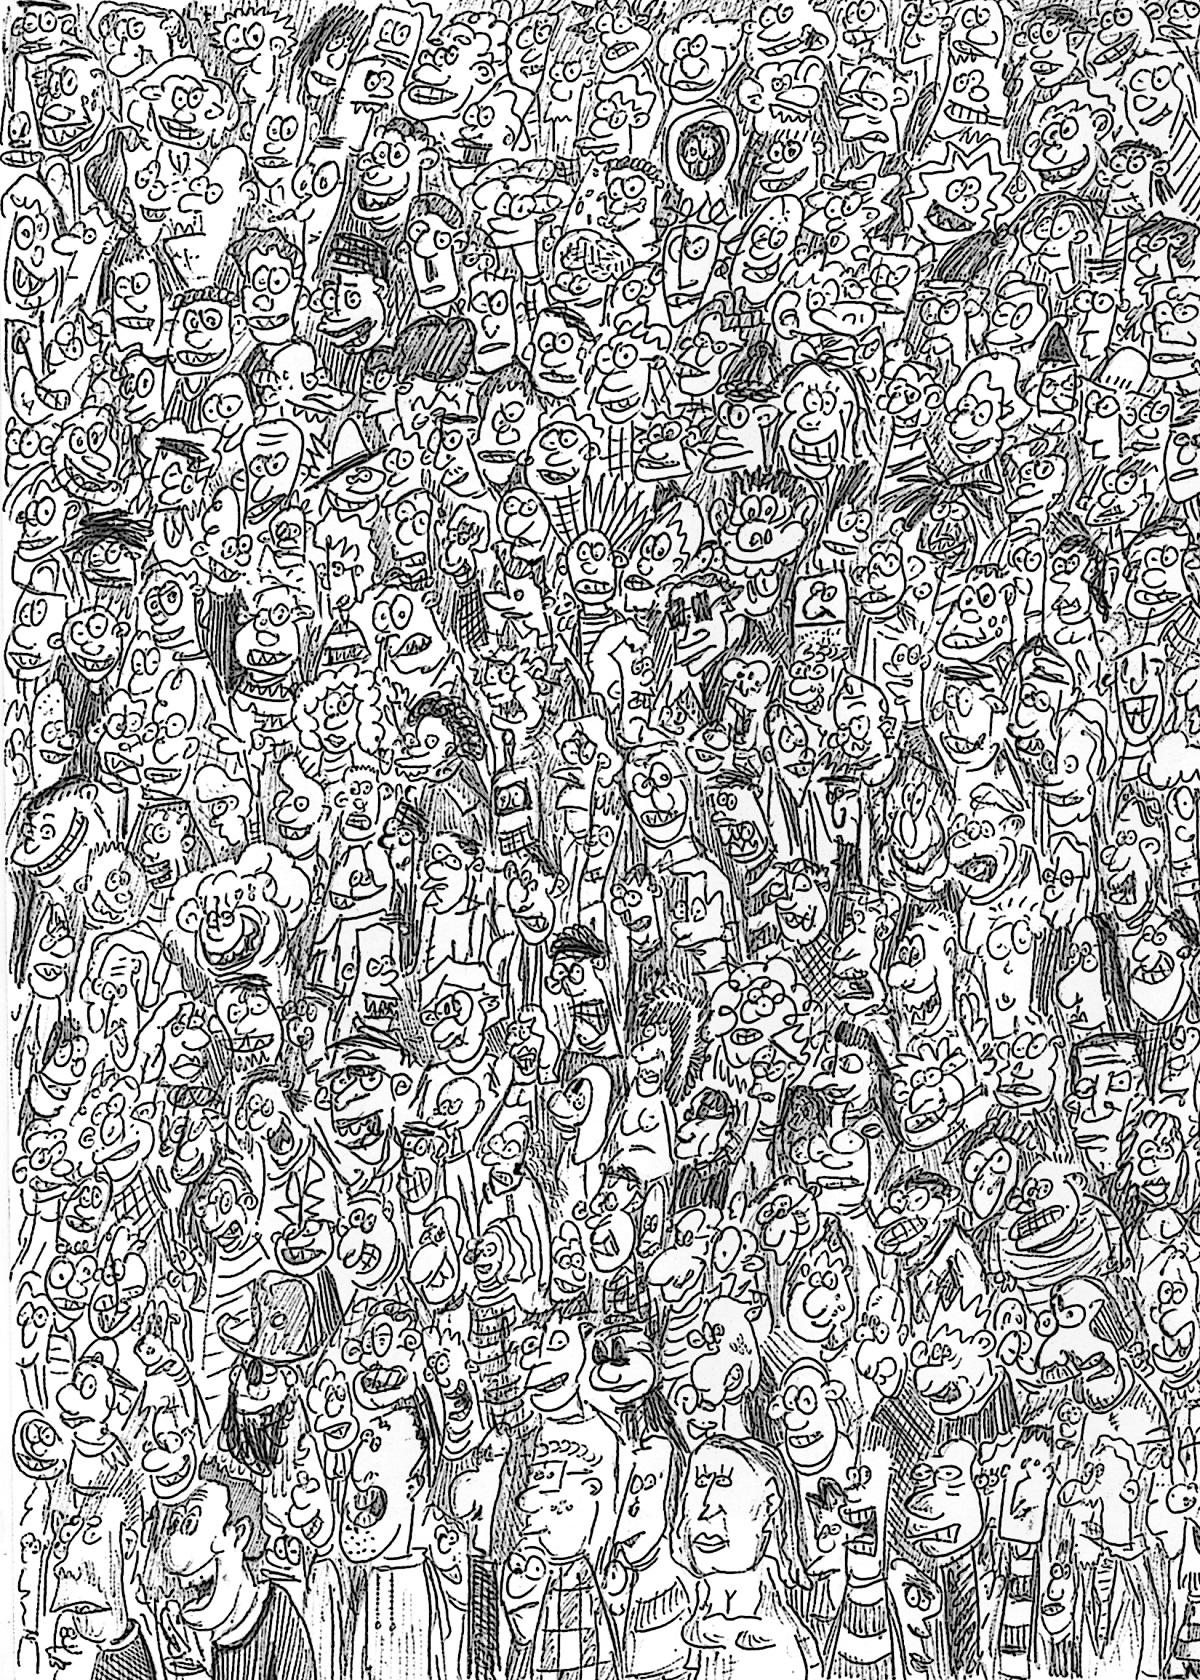 Drawn crowd Backhouse Drawn Scene by